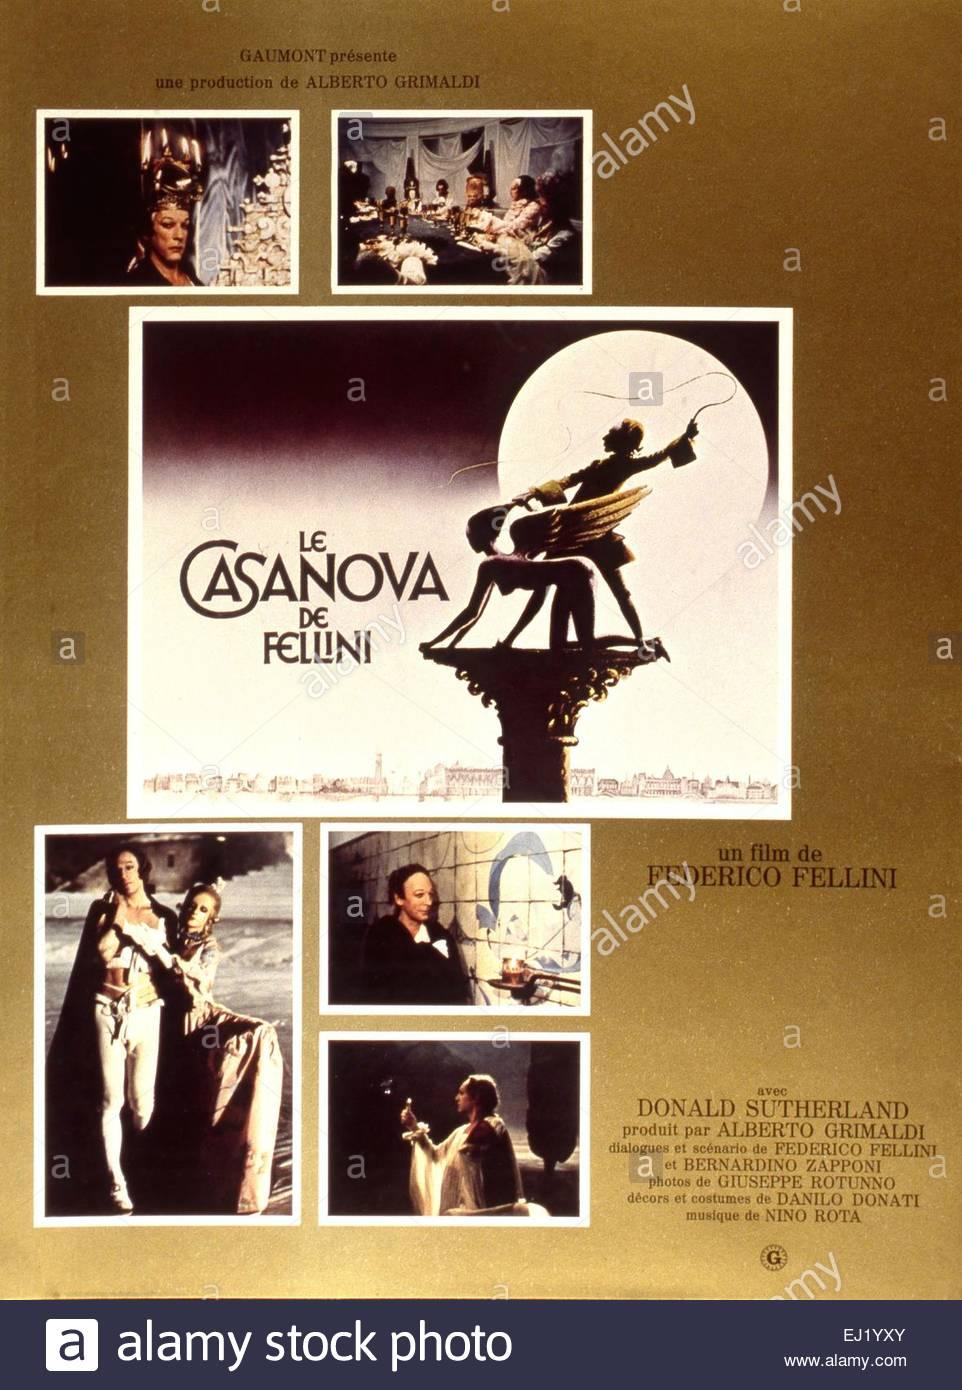 fellinis casanova poster